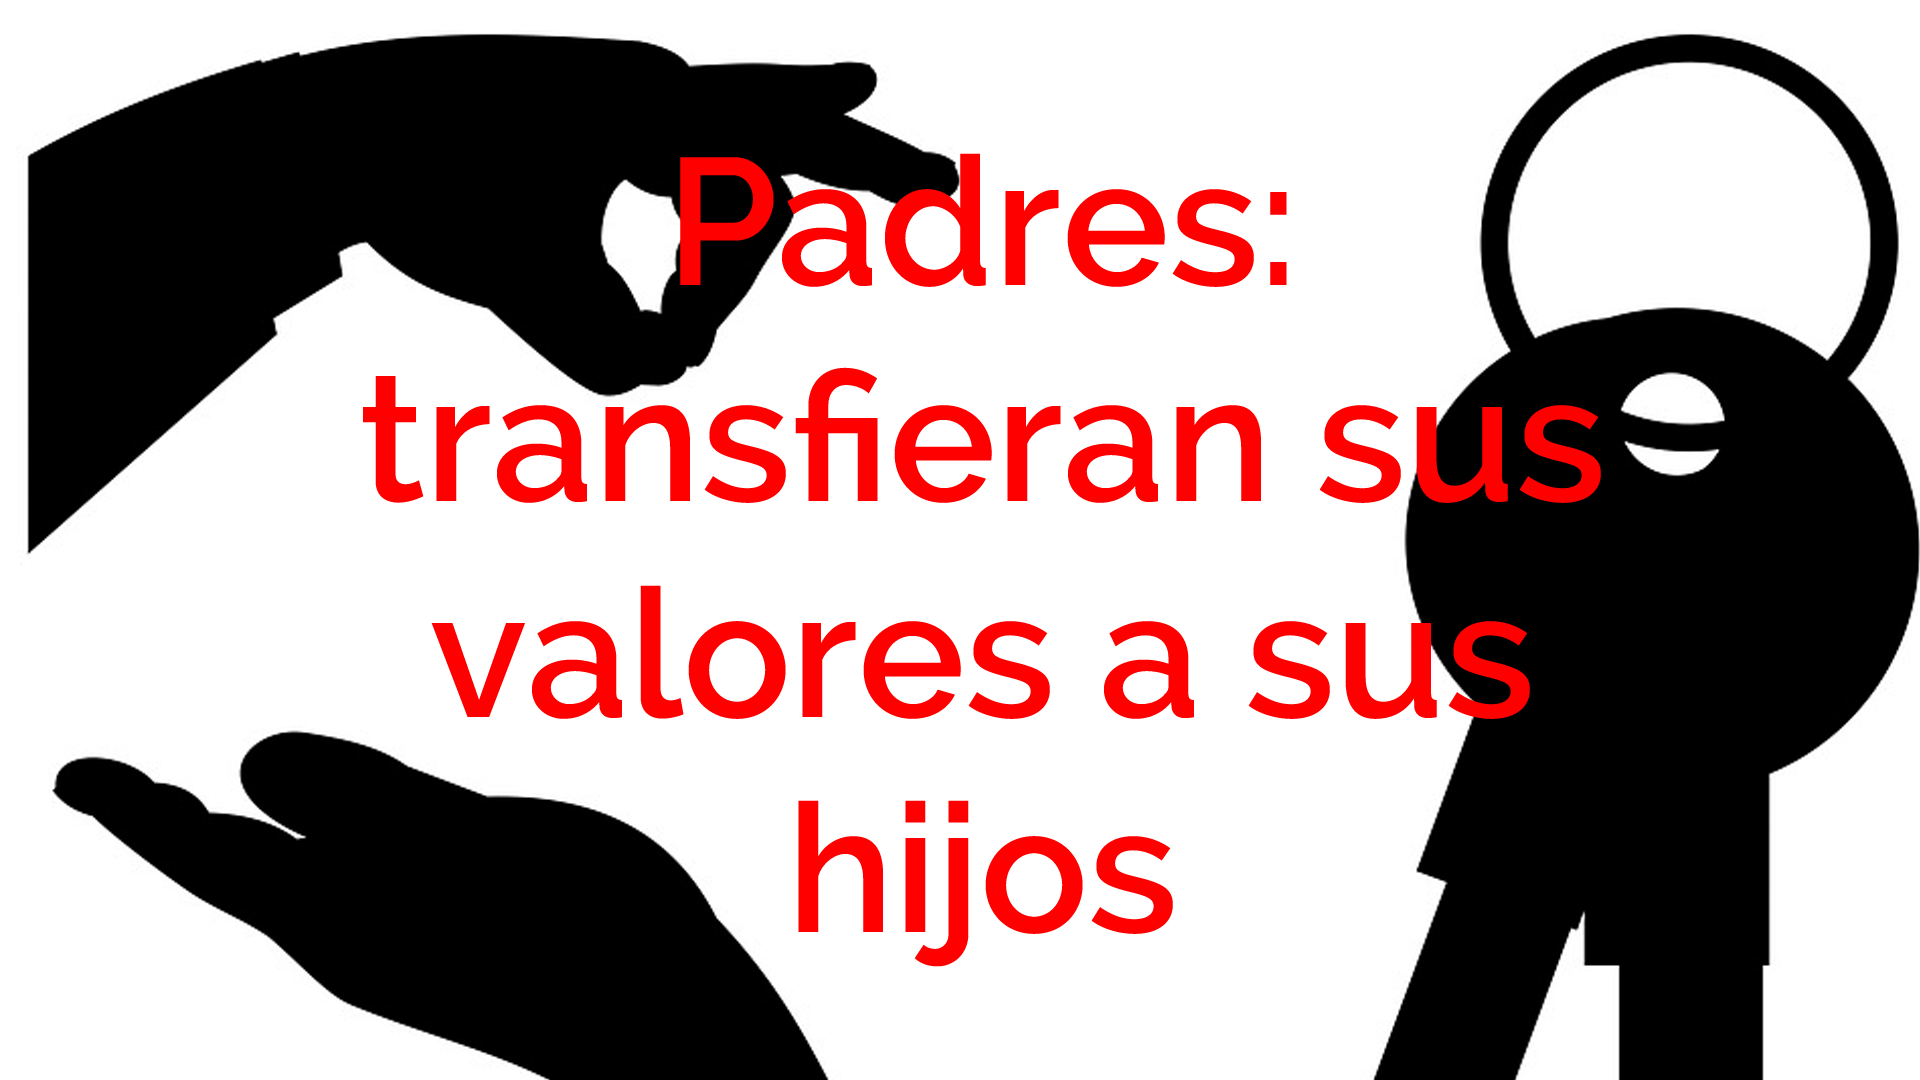 00-fi-padres-transfieran-sus-valores-a-sus-hijos